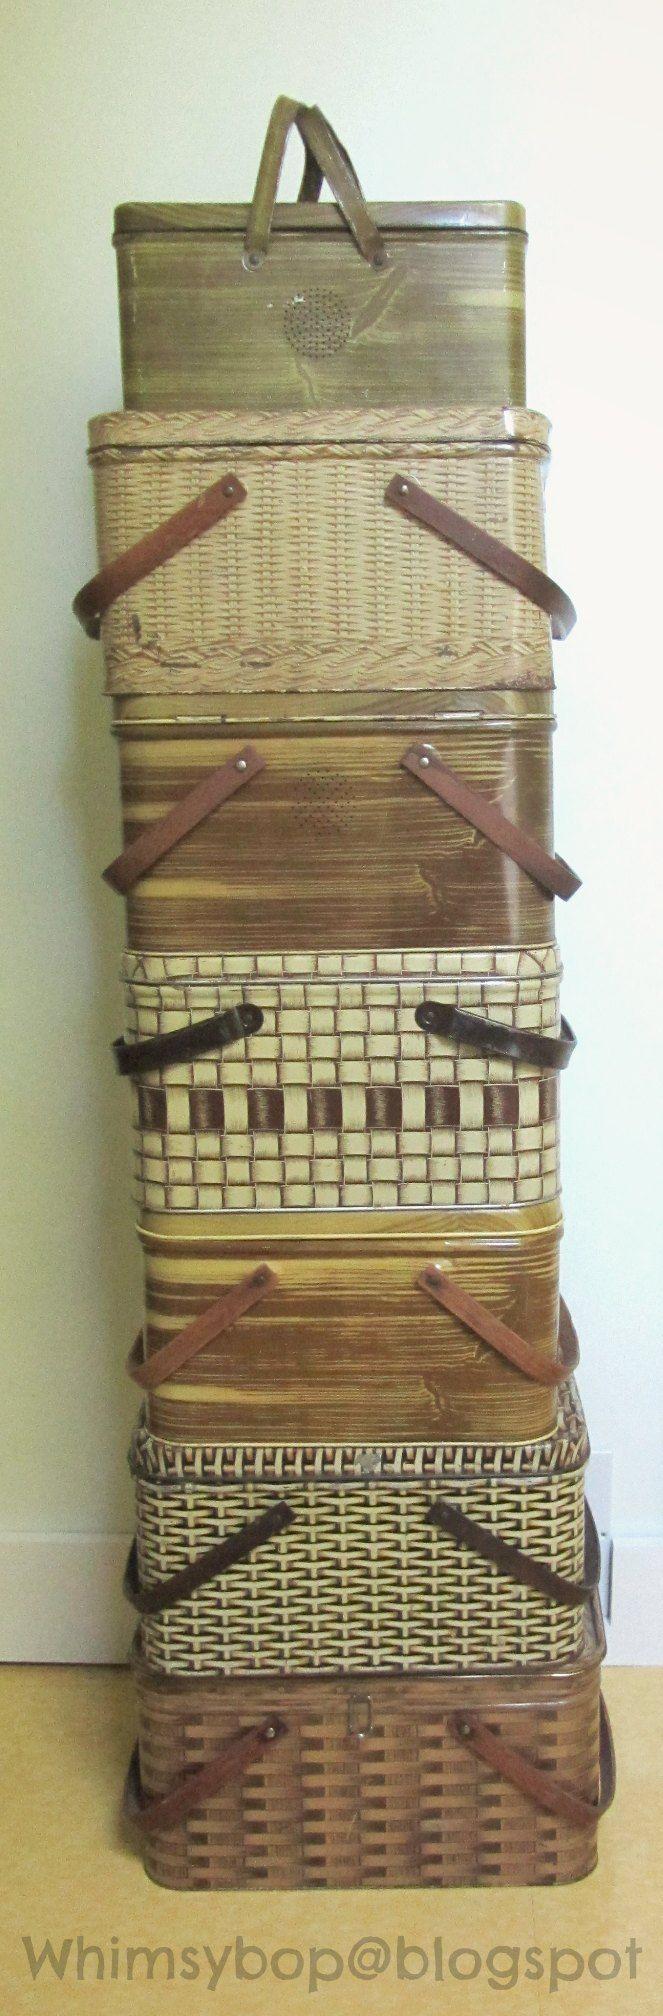 vintage tin picnic baskets